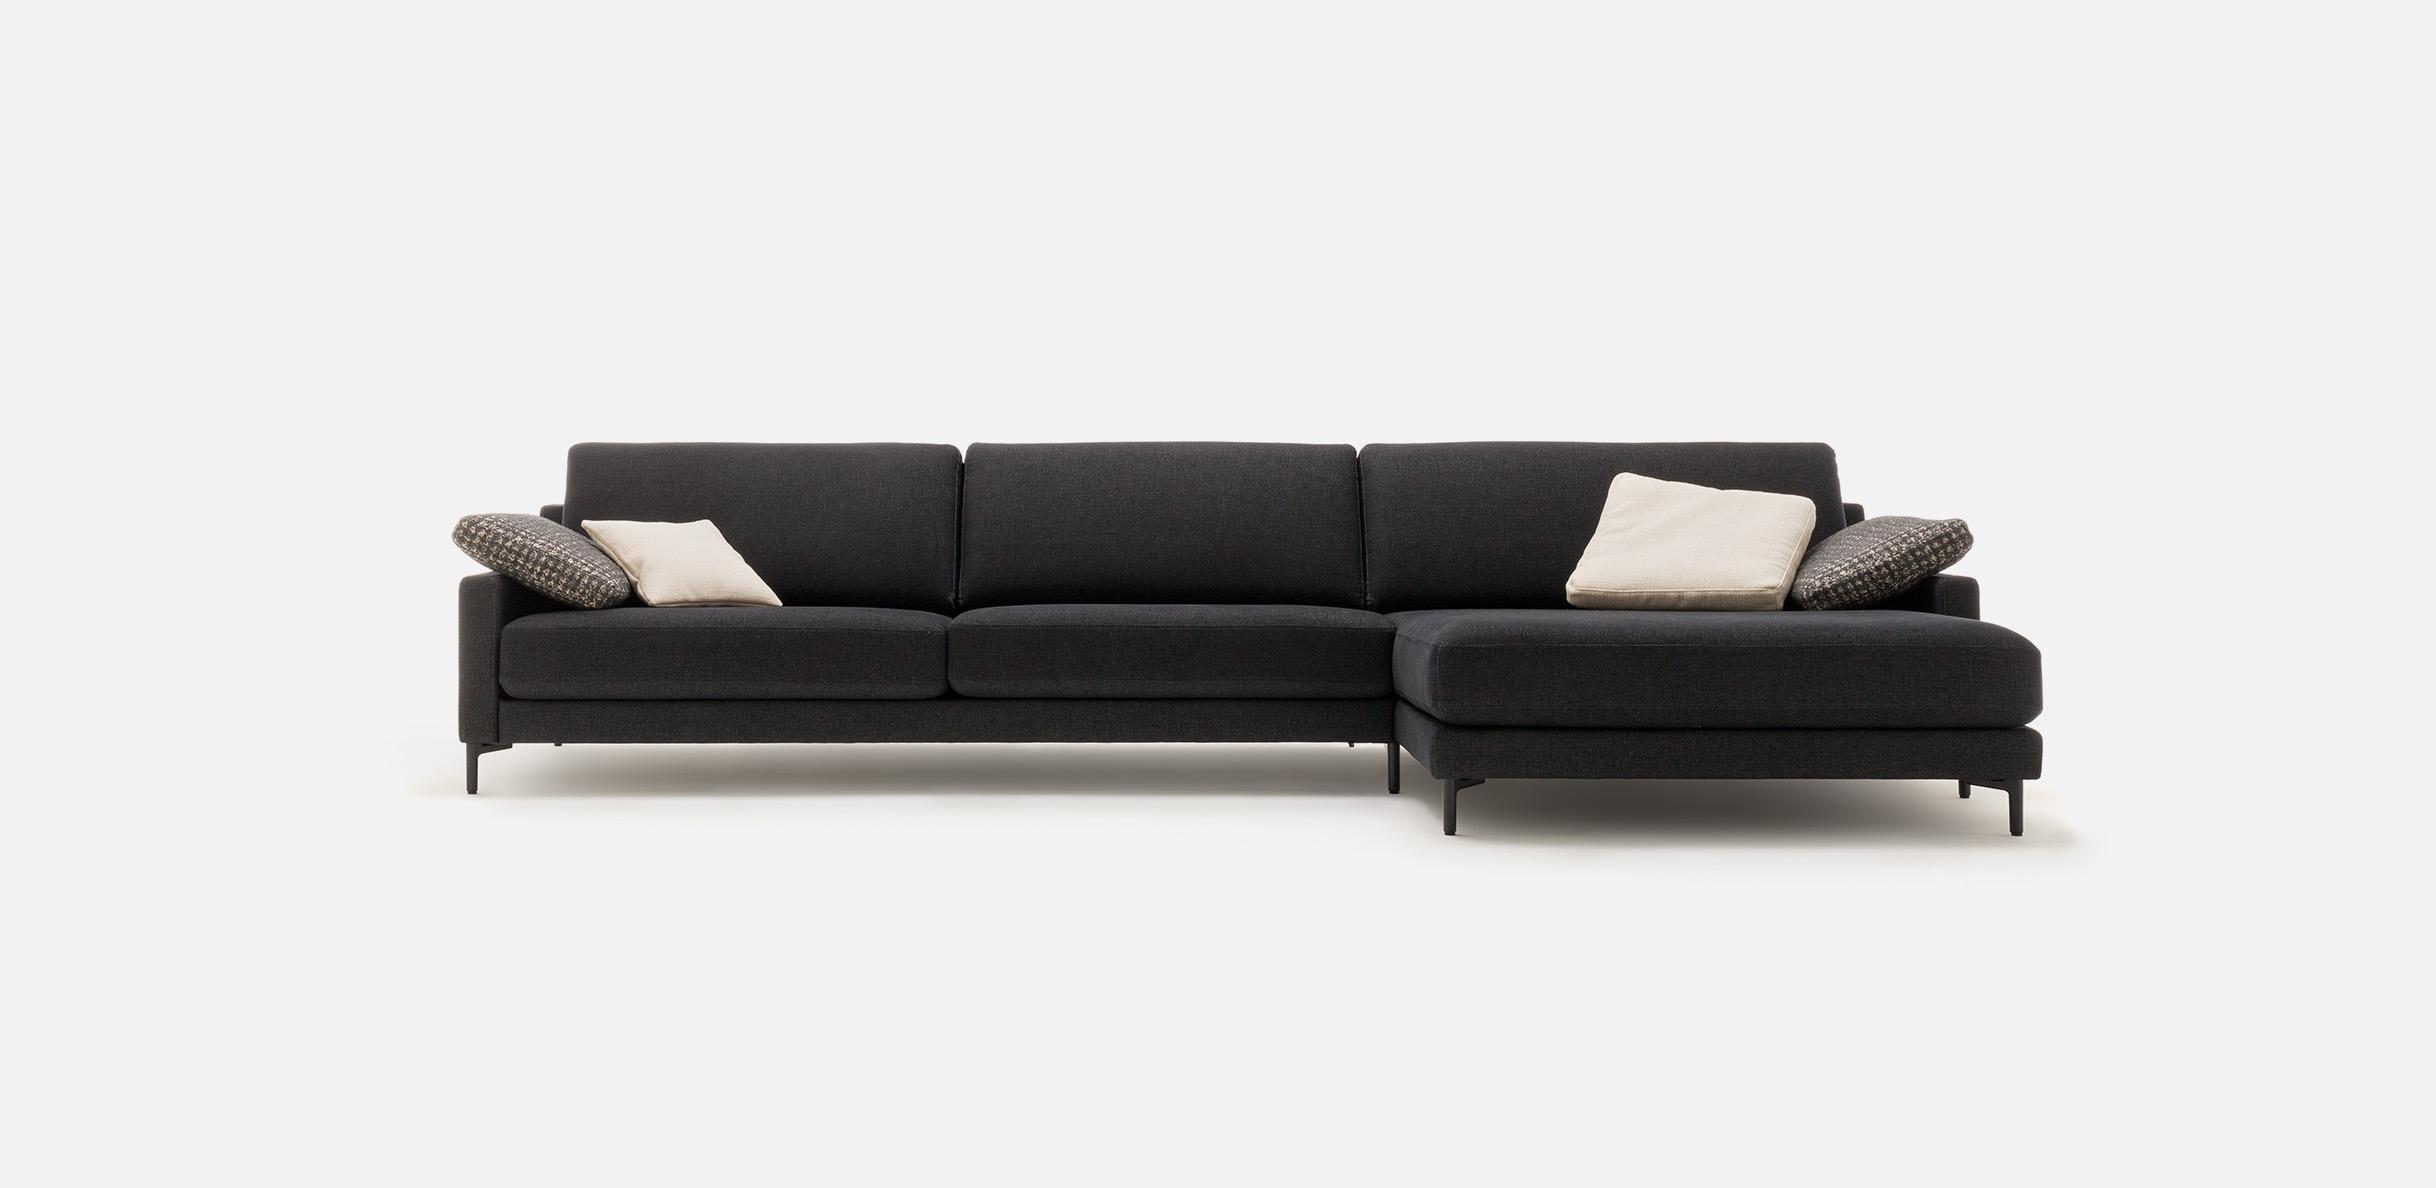 Full Size of Sofa Rolf Benz Freistil 134 Outlet Mera Kaufen Gebraucht Verkaufen Leder Sale Couch Cara Sessel Ebay Kleinanzeigen 180 Grau Barock Vitra Big L Form Blau Sofa Sofa Rolf Benz